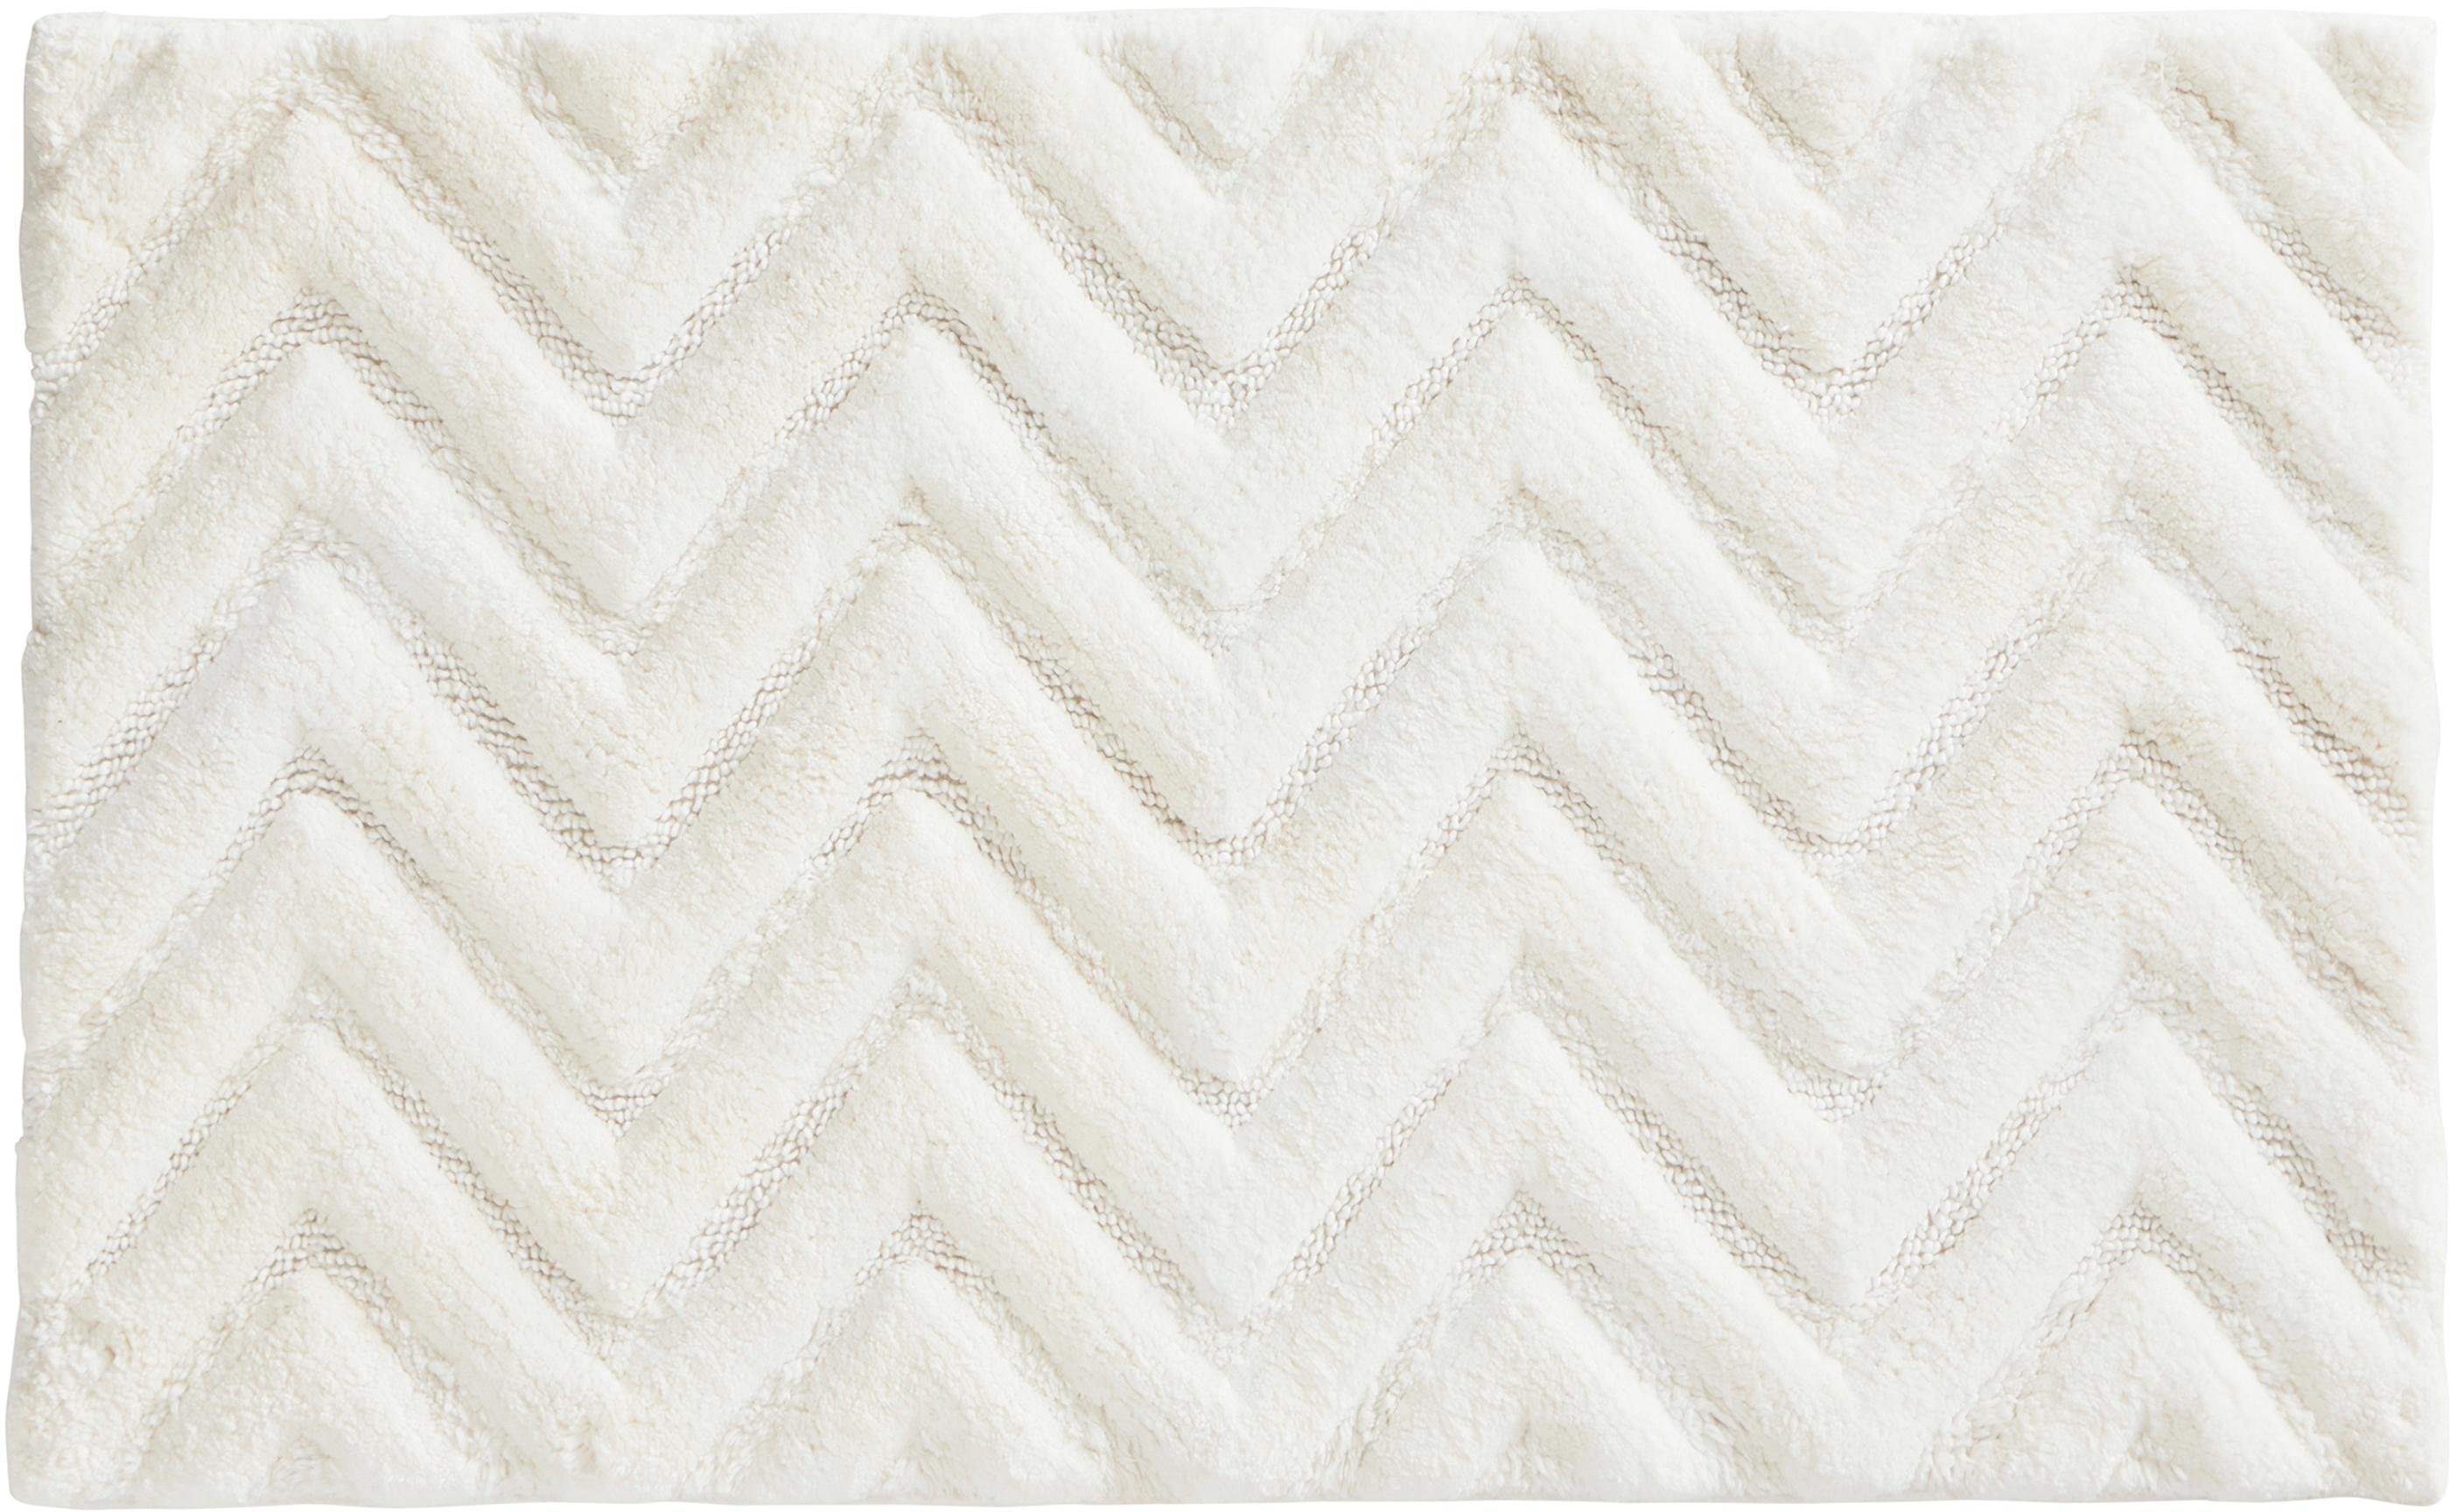 Tappeto bagno morbido bianco Arild, Cotone, Bianco latteo, Larg. 50 x Lung. 80 cm